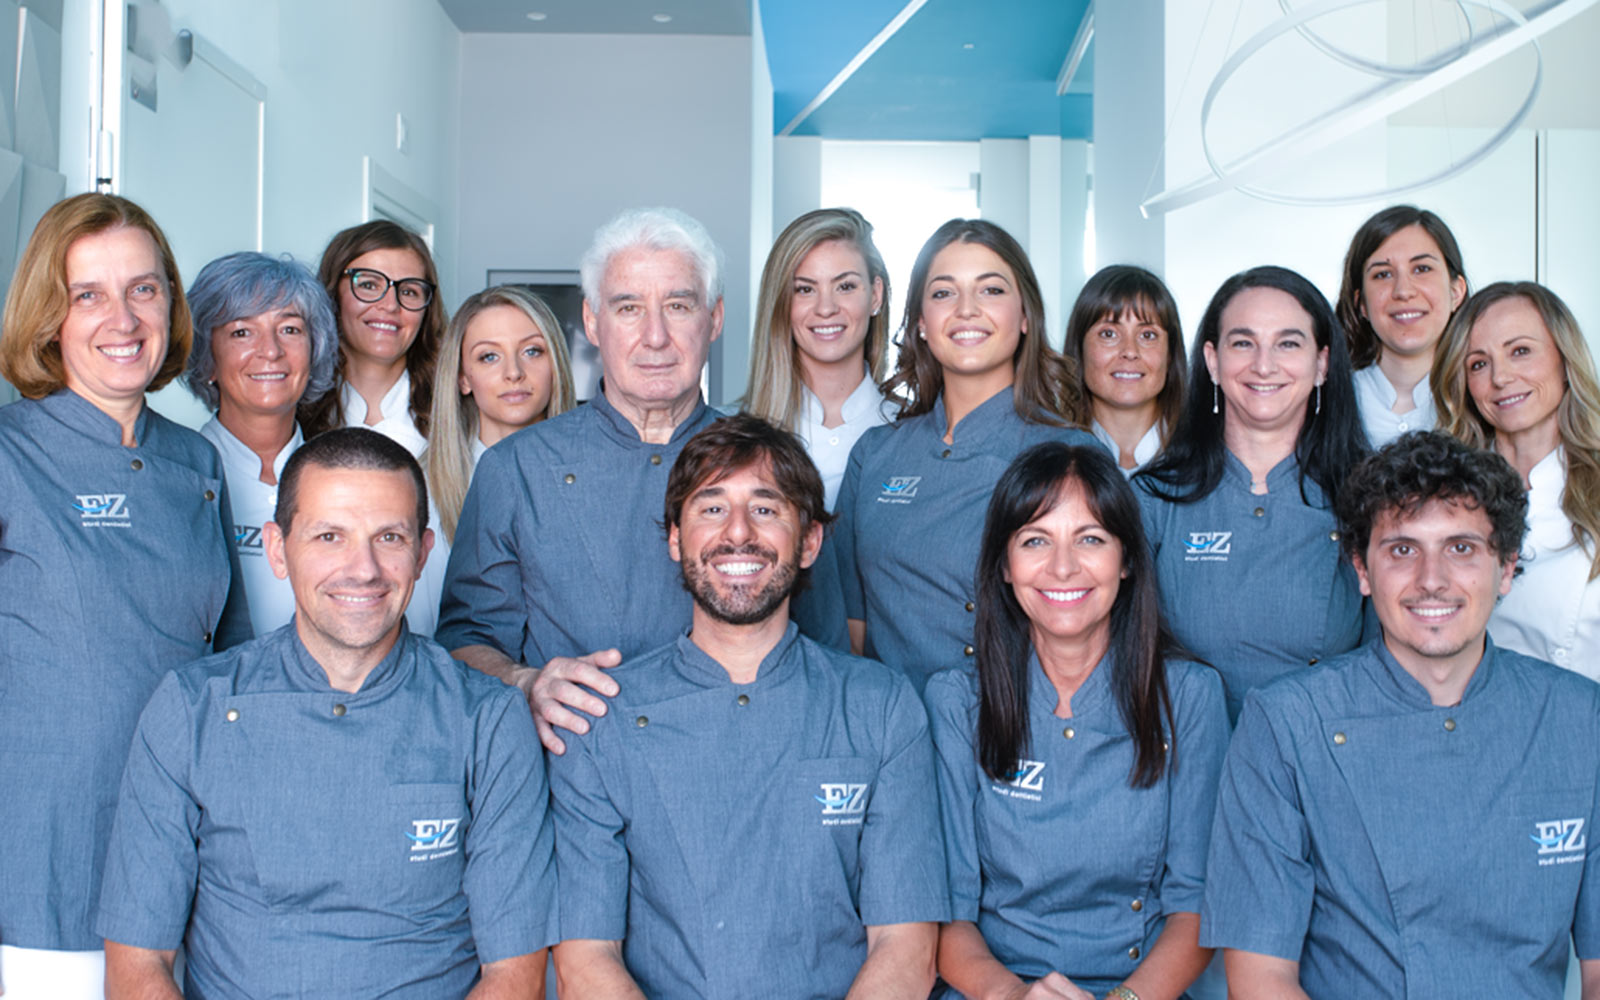 Team Studio Dentistico EZ Zamprogno